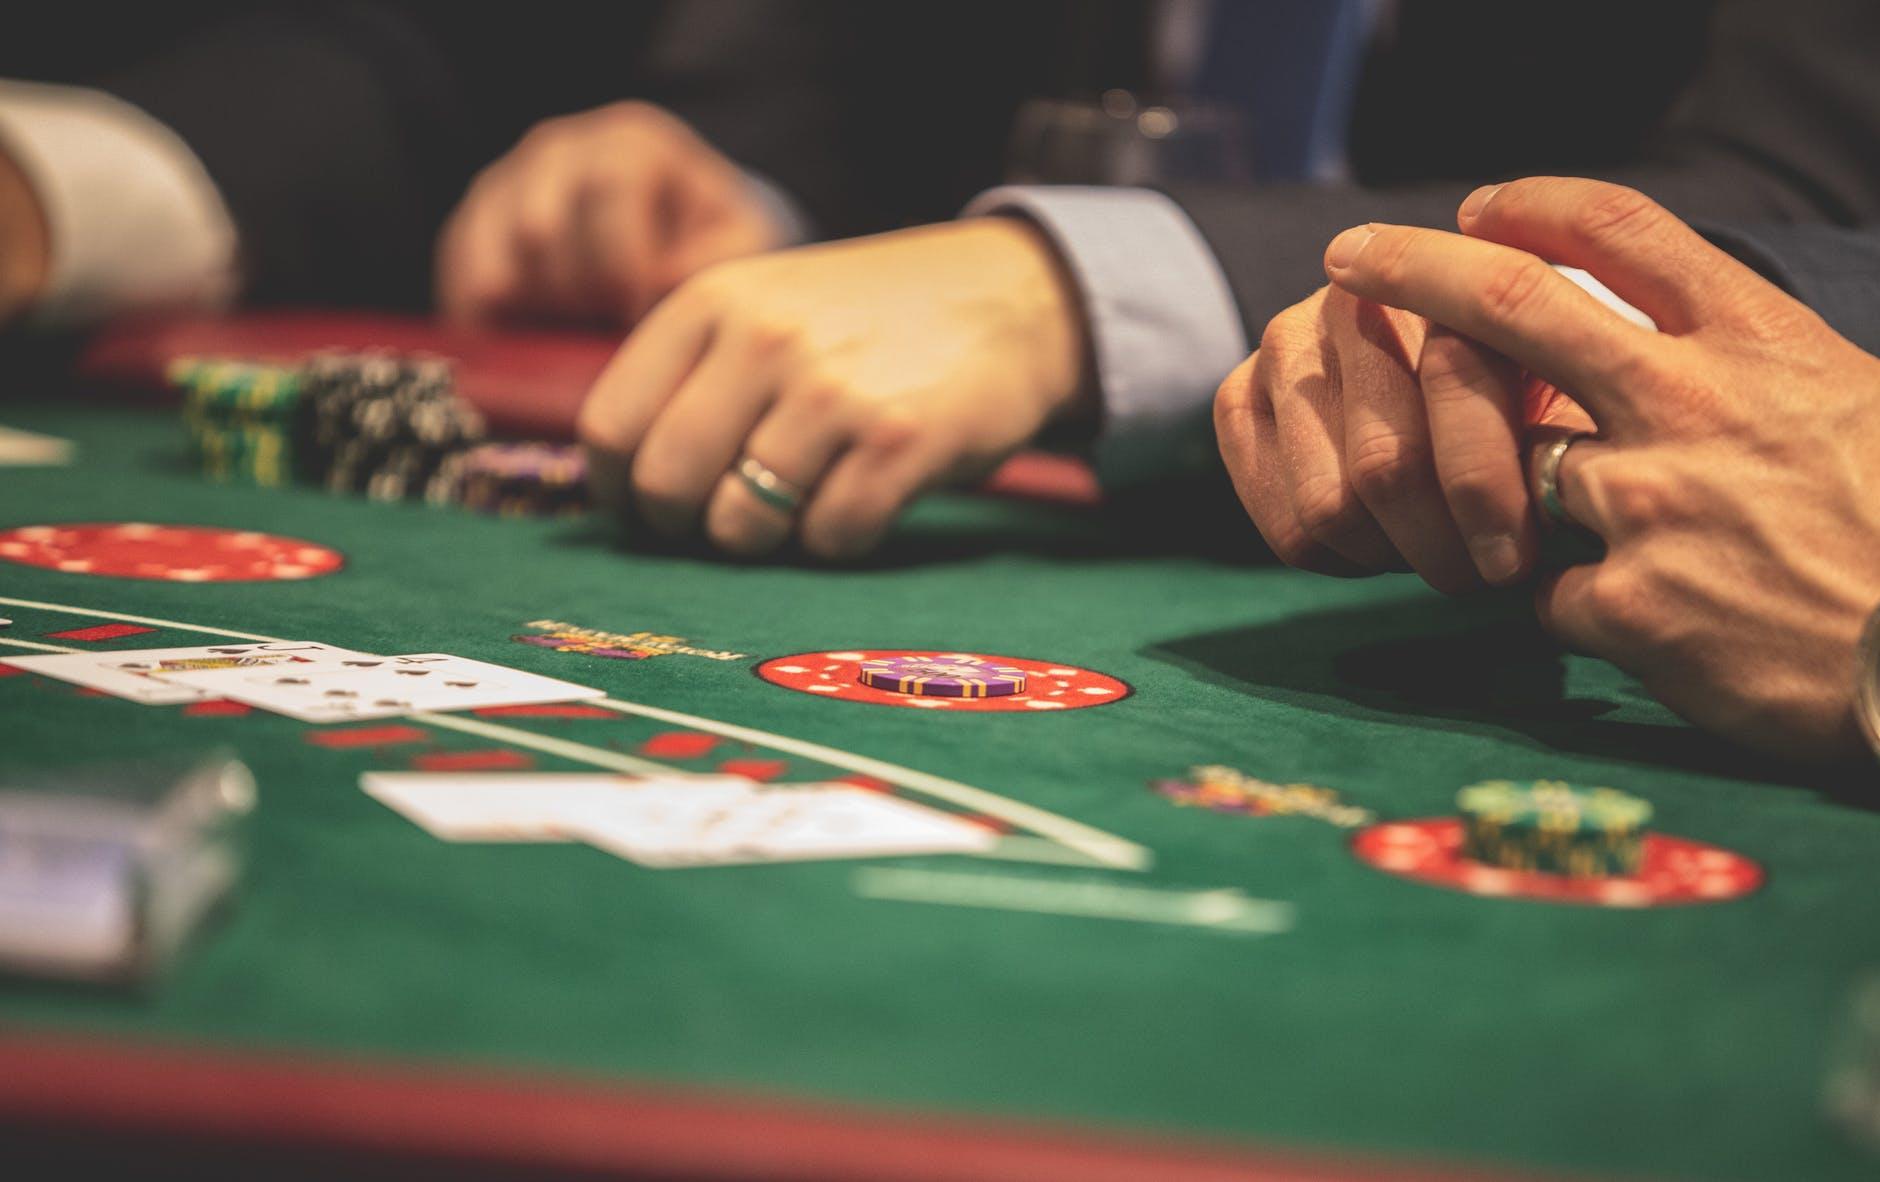 Казино рк онлайн покер безплатно